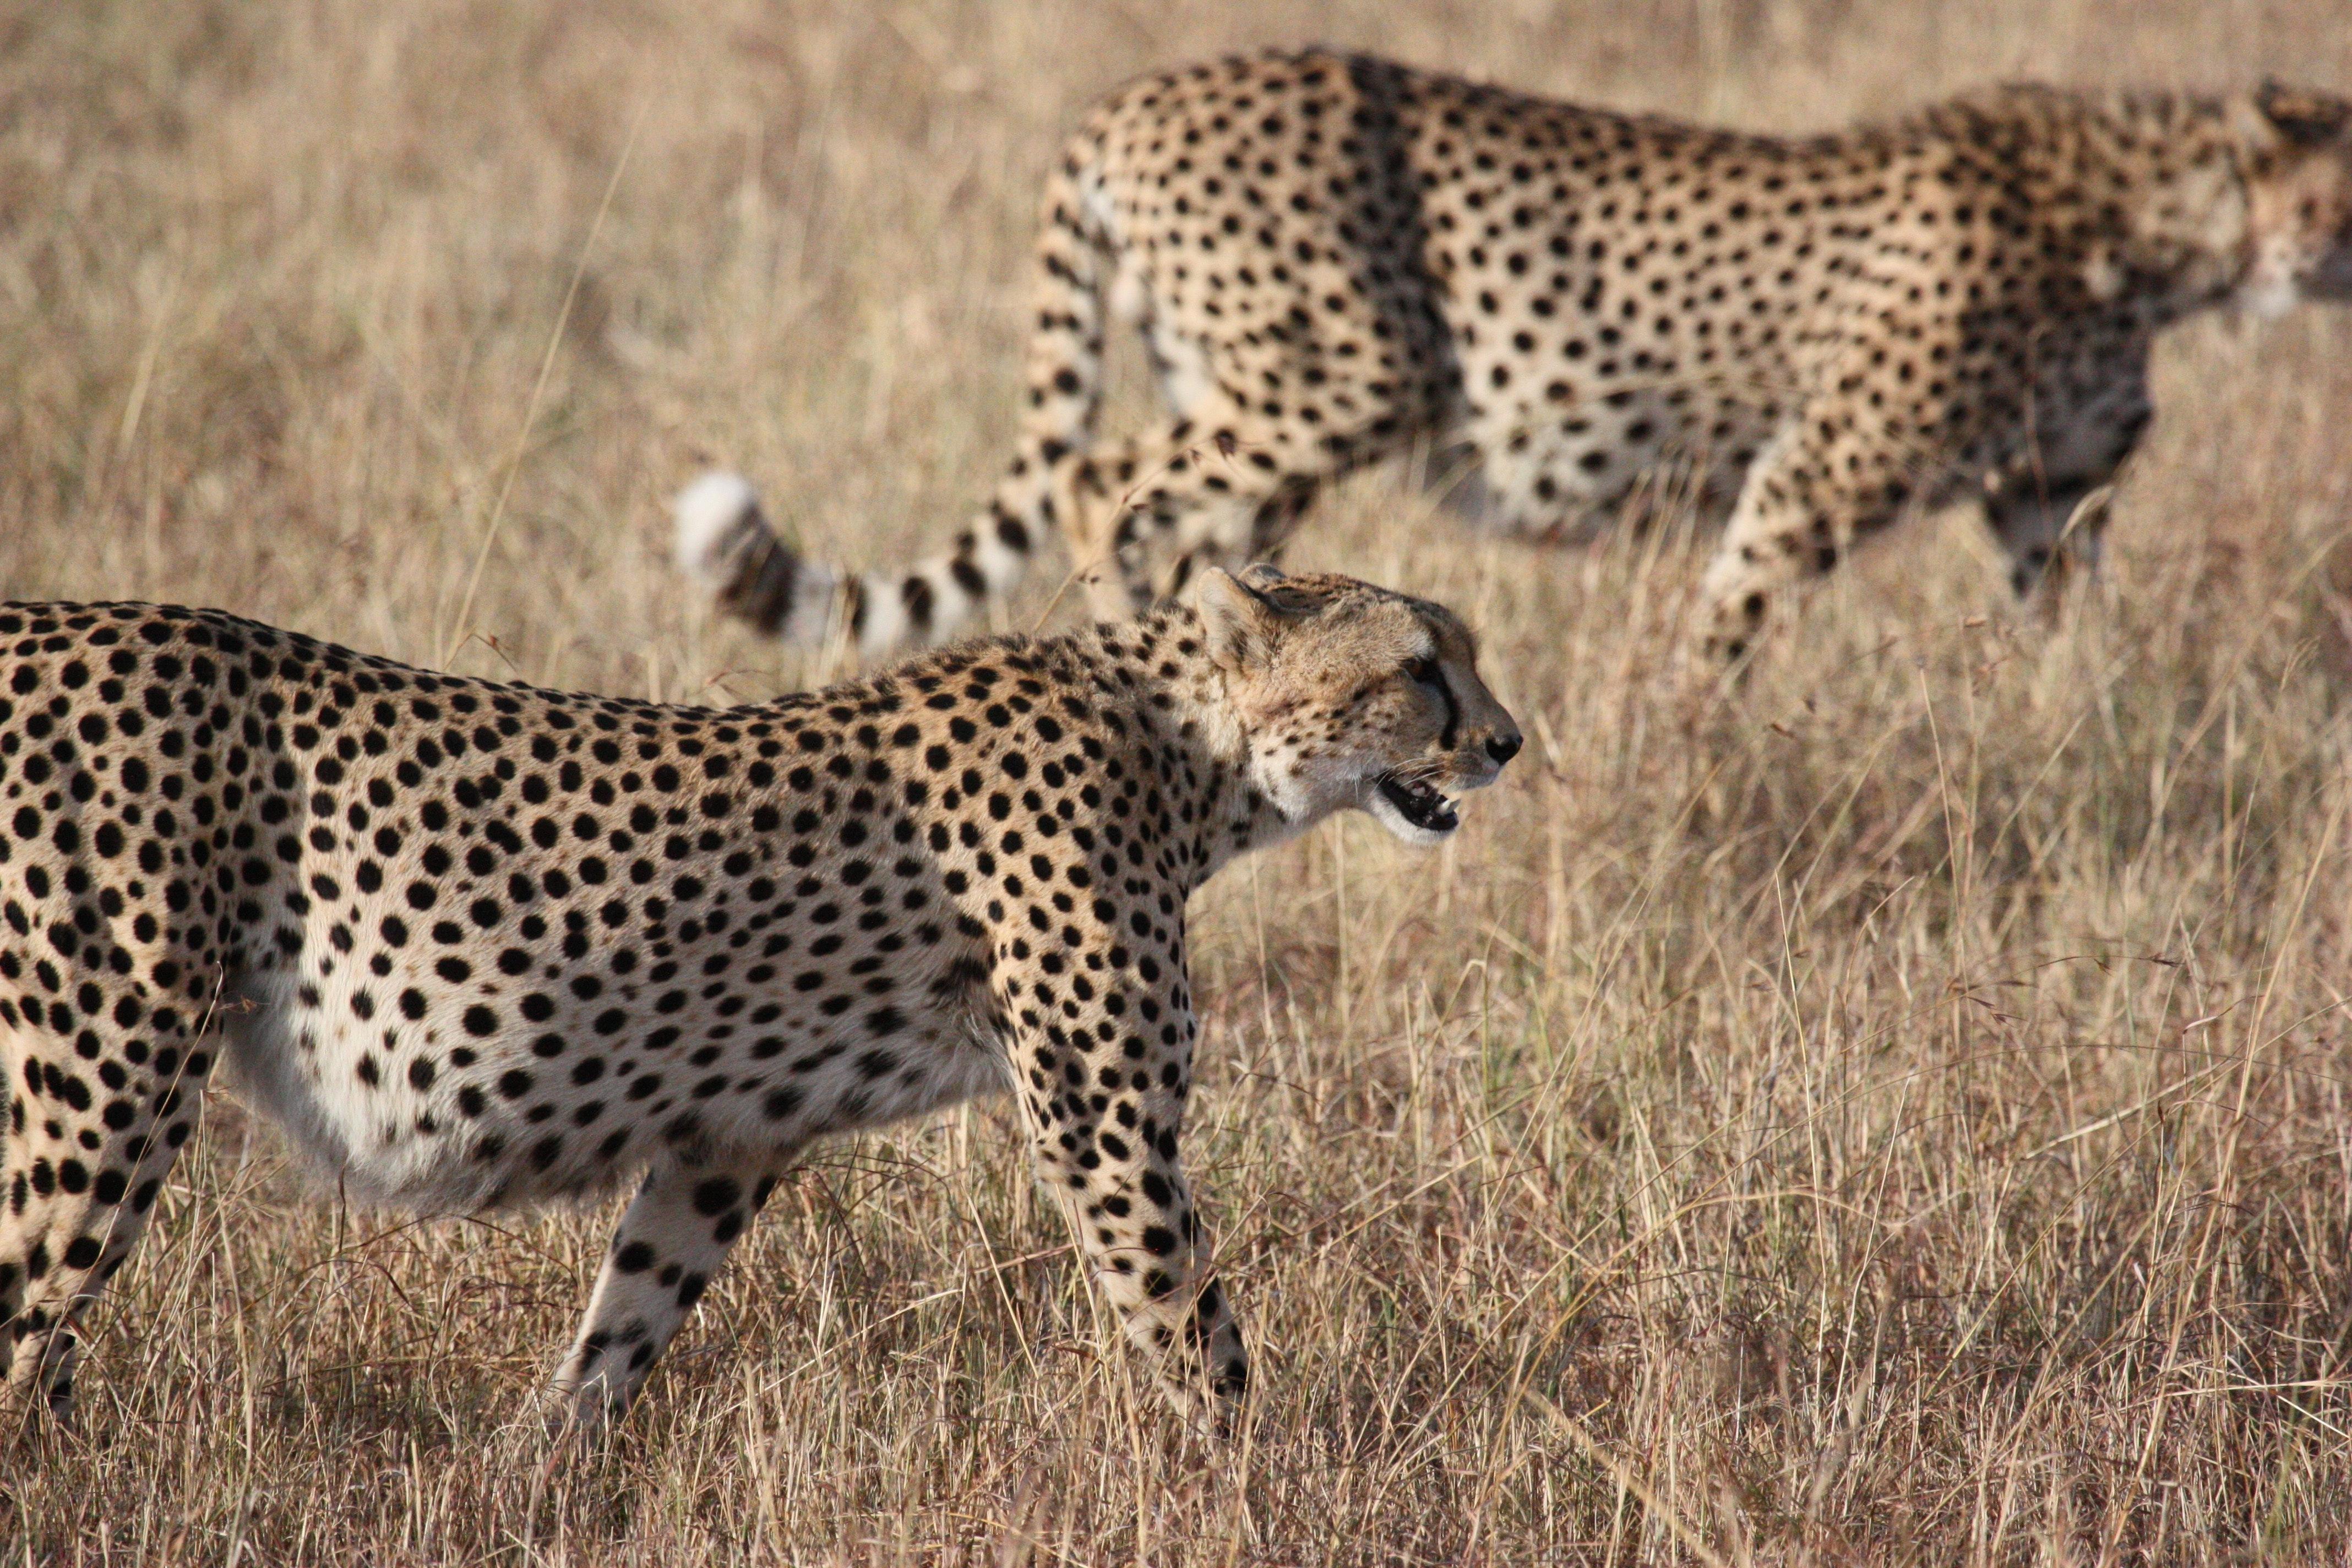 2 cheetah on the brown grass lawn photo